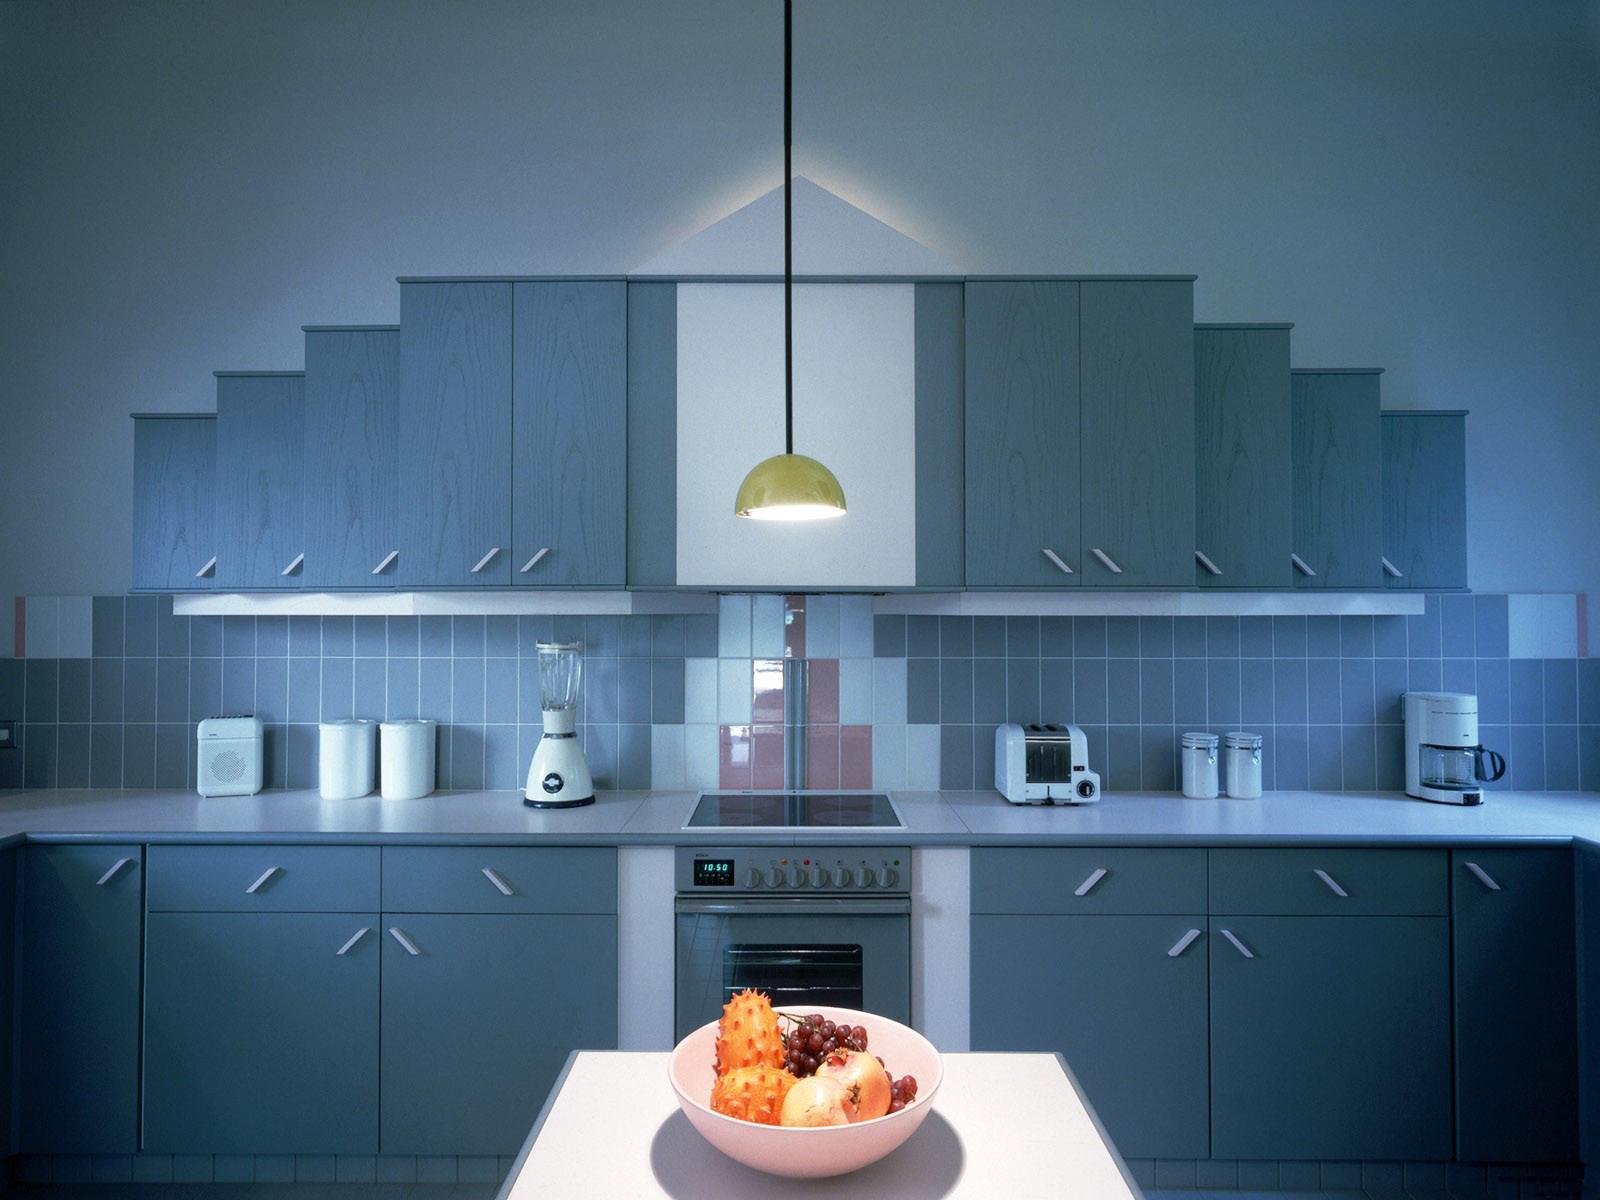 kitchen interior design apartment Backgrounds